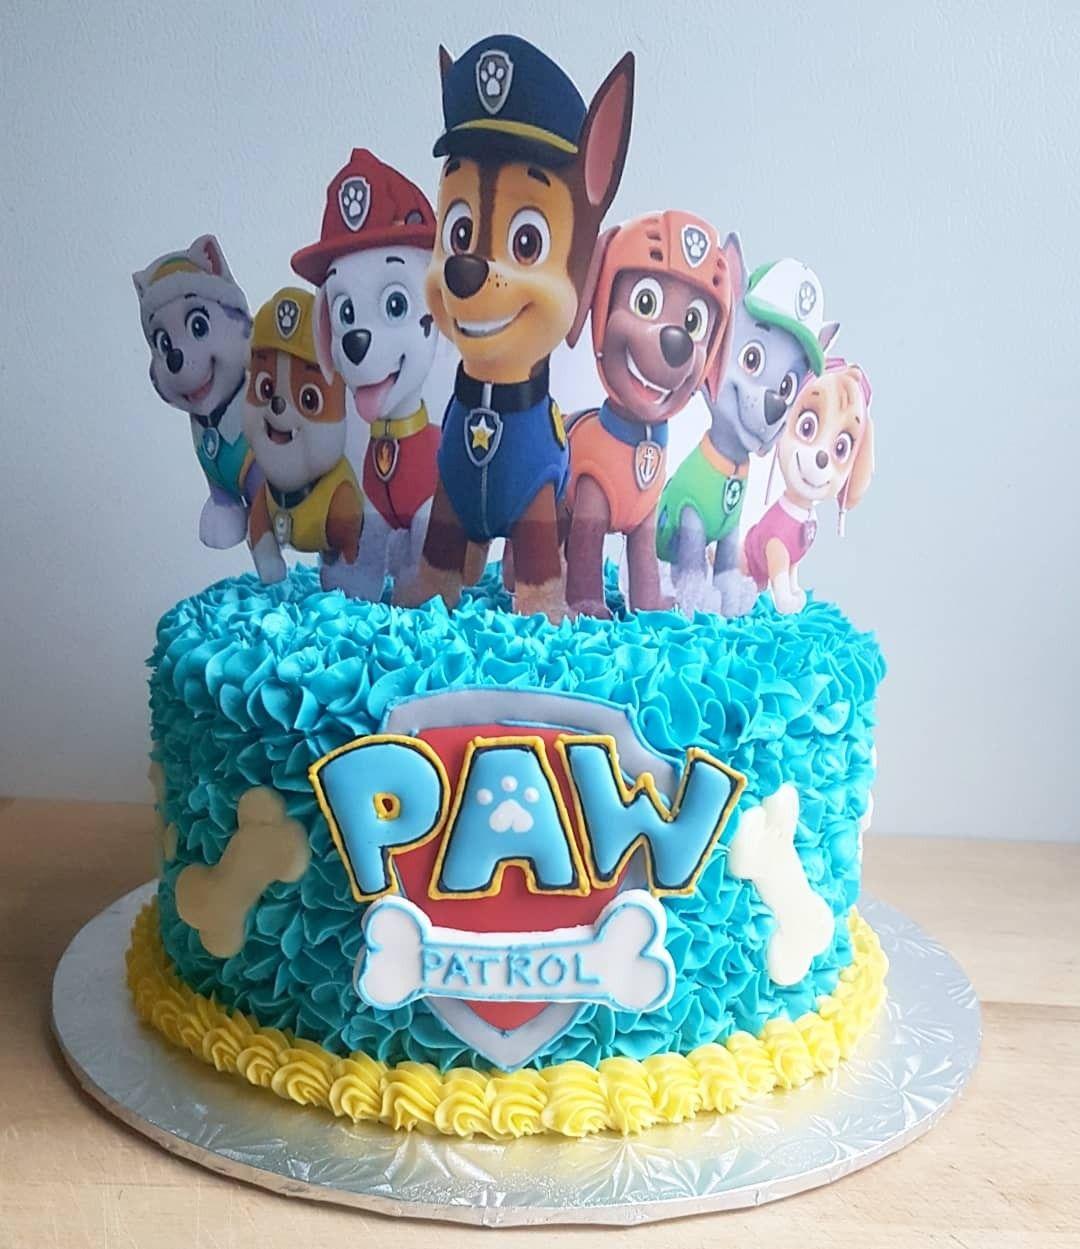 Paw patrol cake  All buttercream Birthday cake